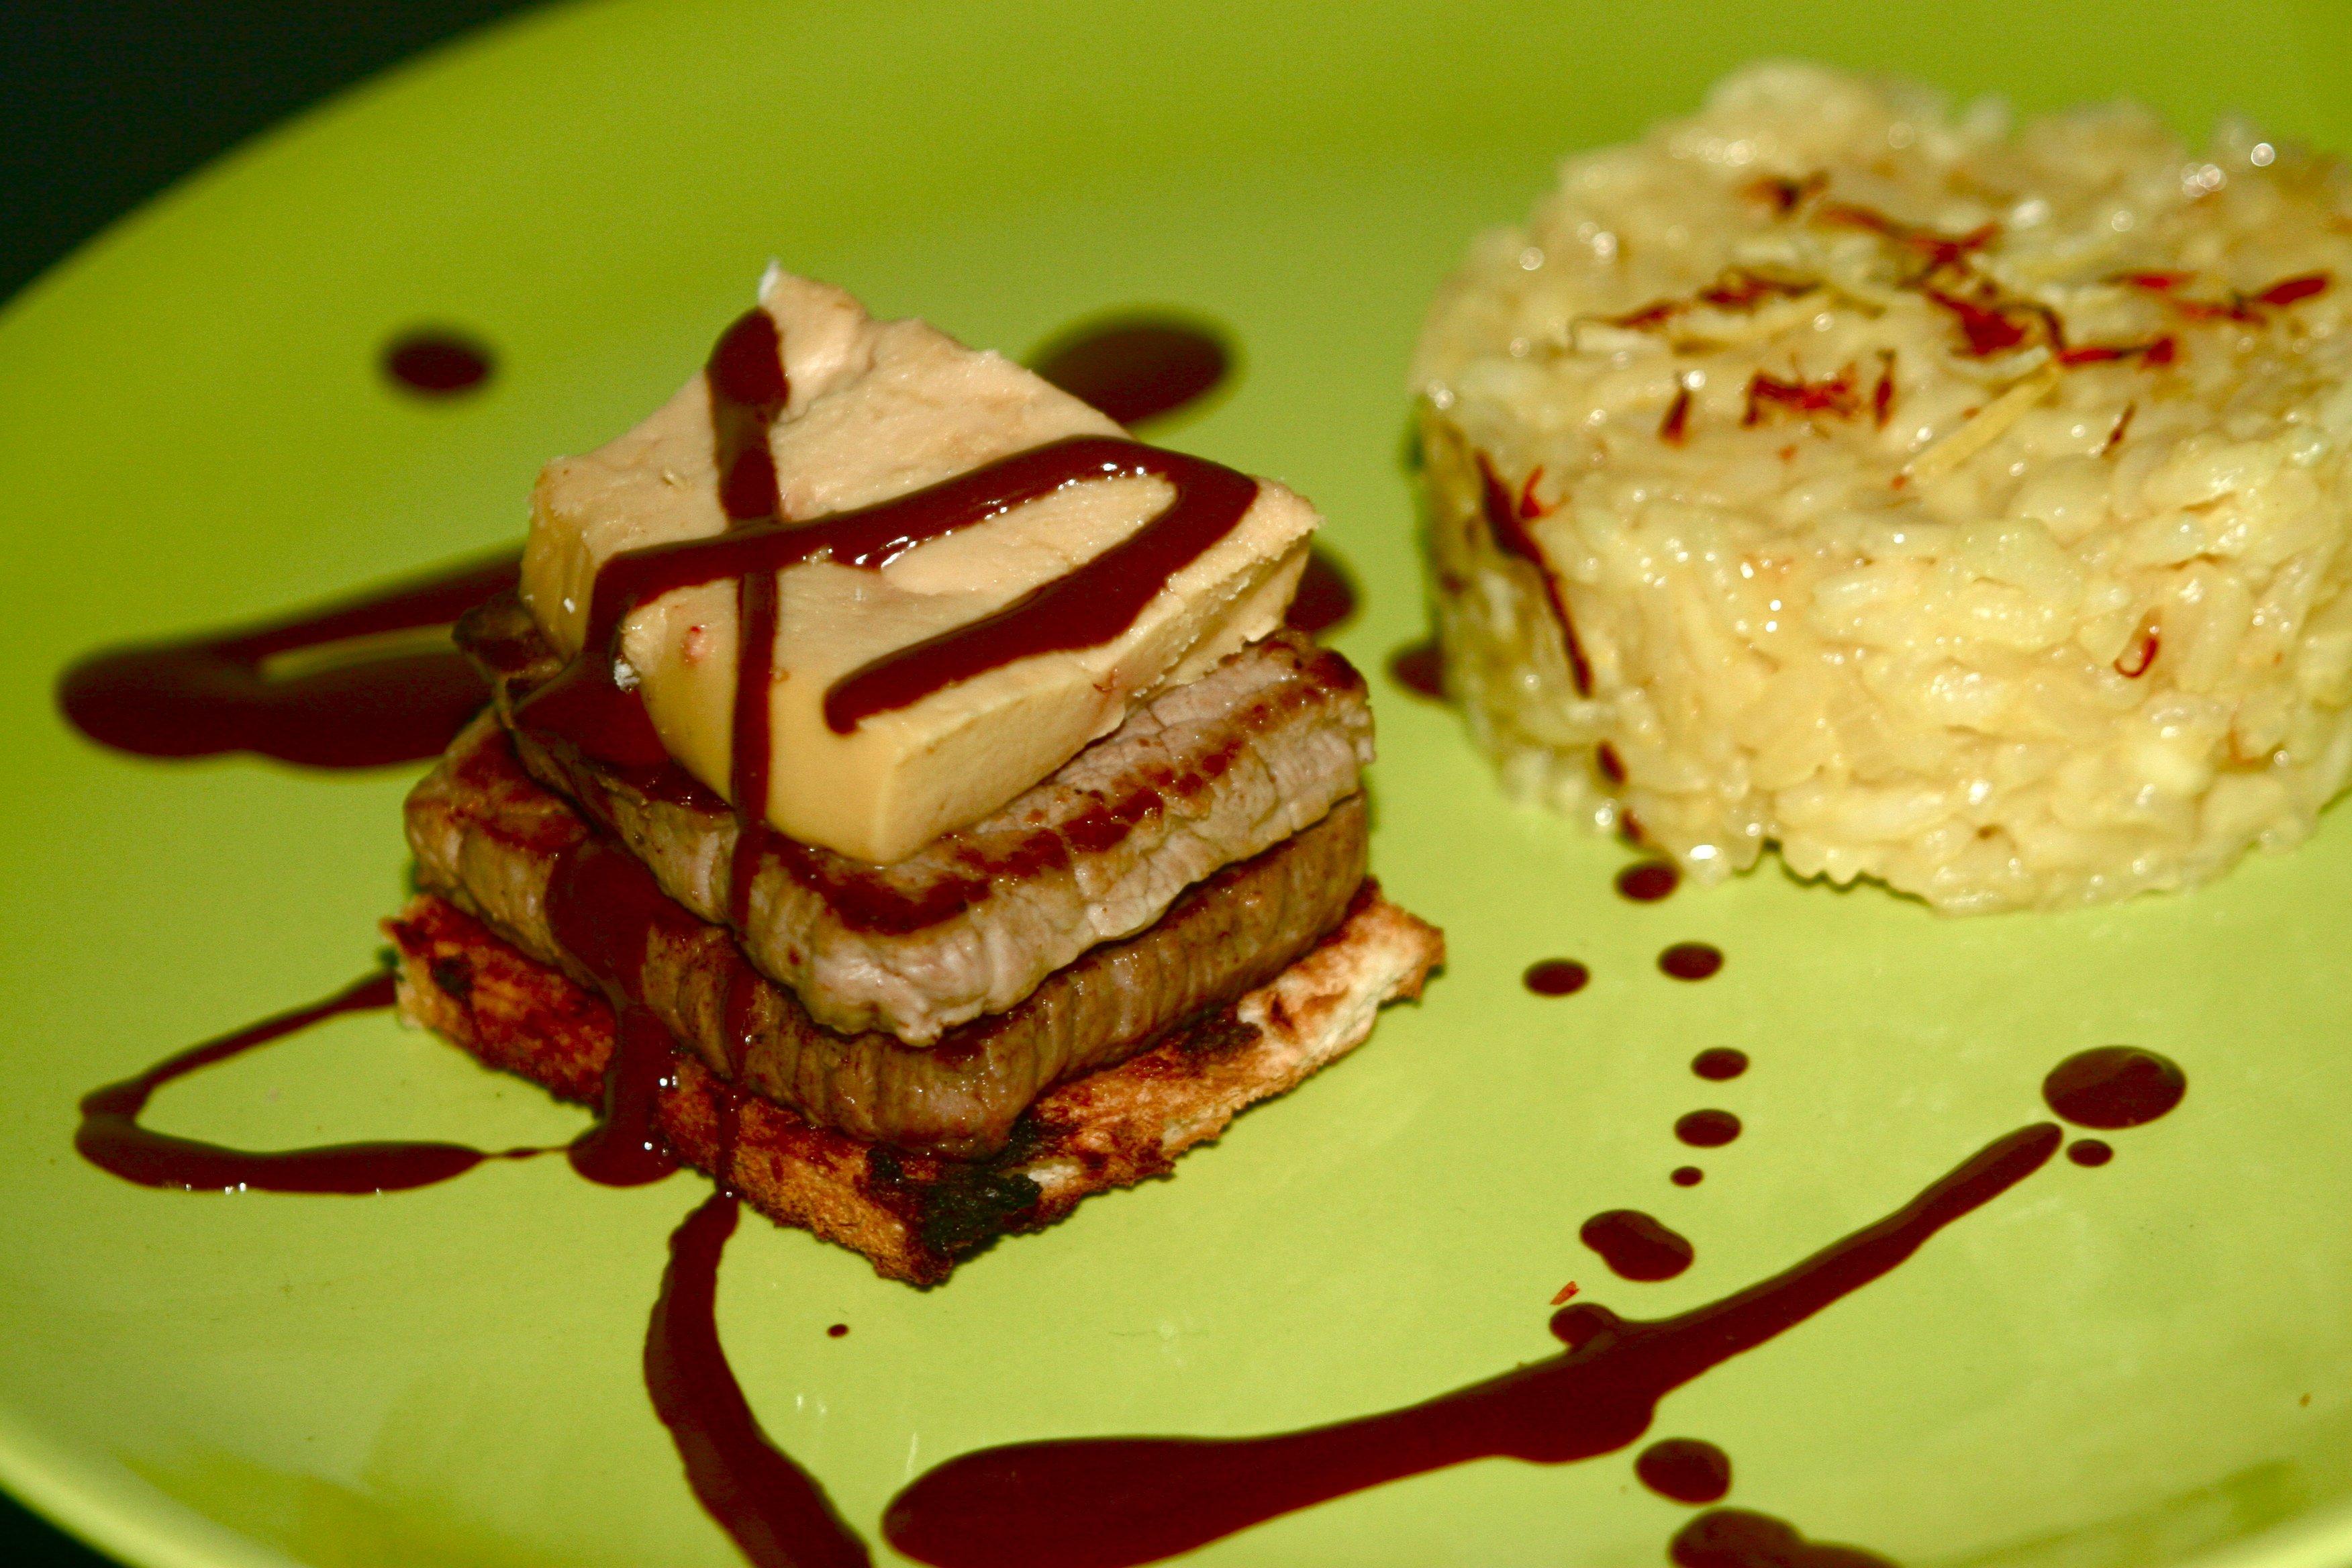 Tournedos rossini sauce chocolat-piment